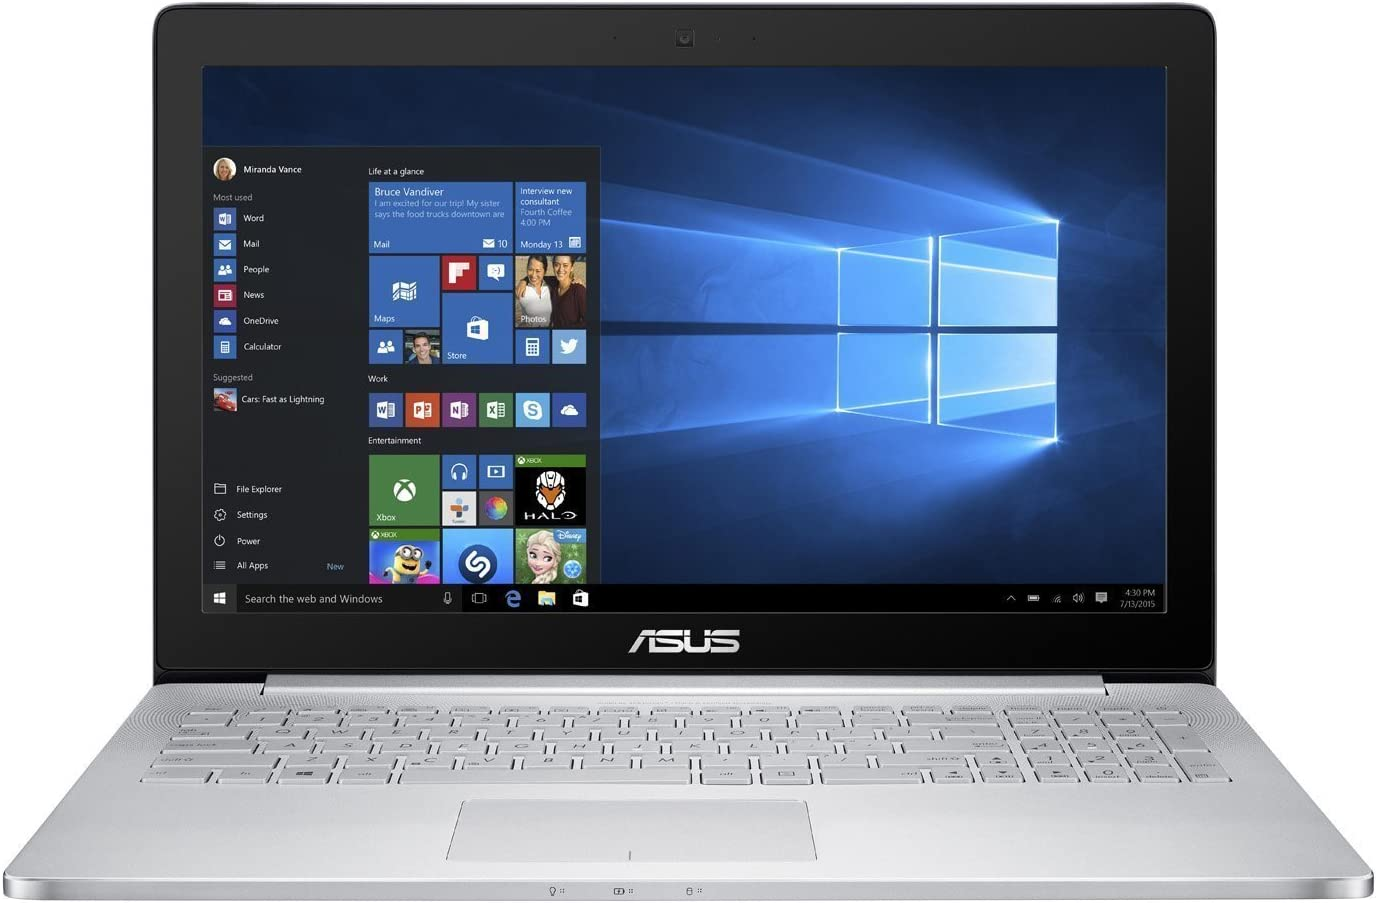 ASUS ZenBook UX501VW 15.6in (Intel Core i7-6700HQ, 16GB RAM, 512GB NVMe SSD, NVIDIA GTX 960M, 2GB GPU, IPS UHD Touchscreen Glossy, Windows 10) 64 bit Gaming Laptop (Renewed)